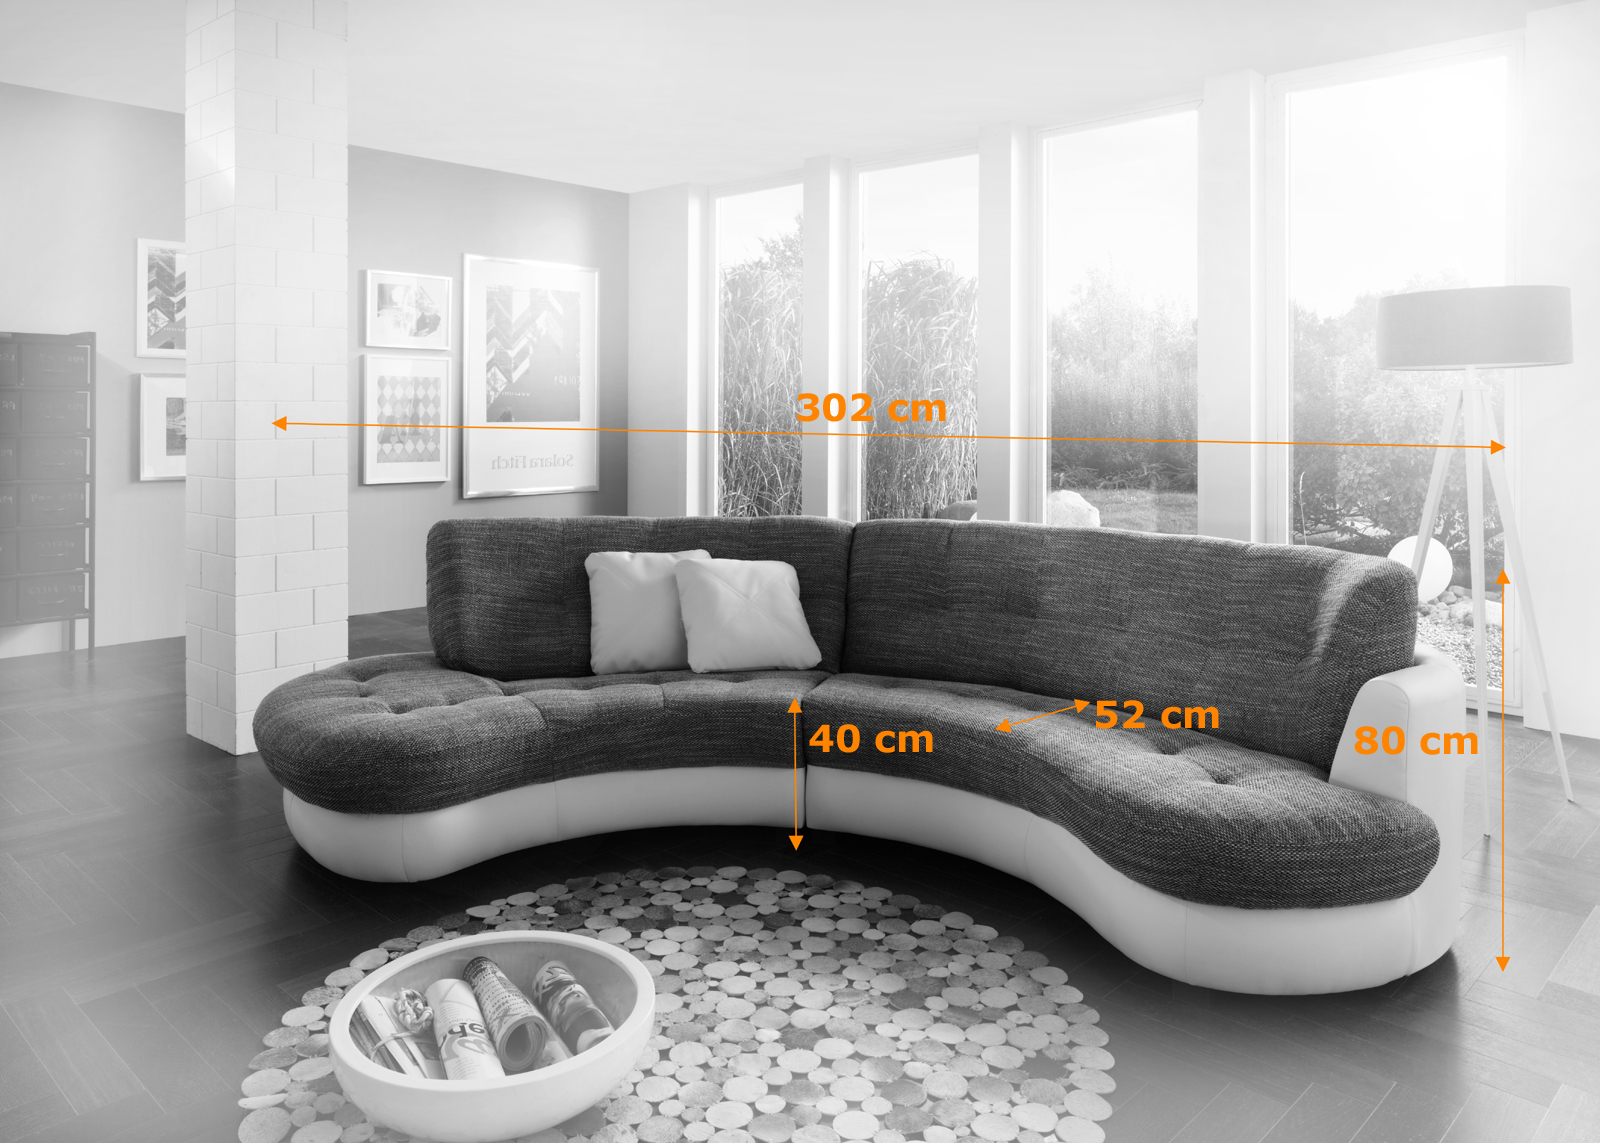 sam ecksofa grau wei roma ol polsterecke 302 x 160 cm. Black Bedroom Furniture Sets. Home Design Ideas